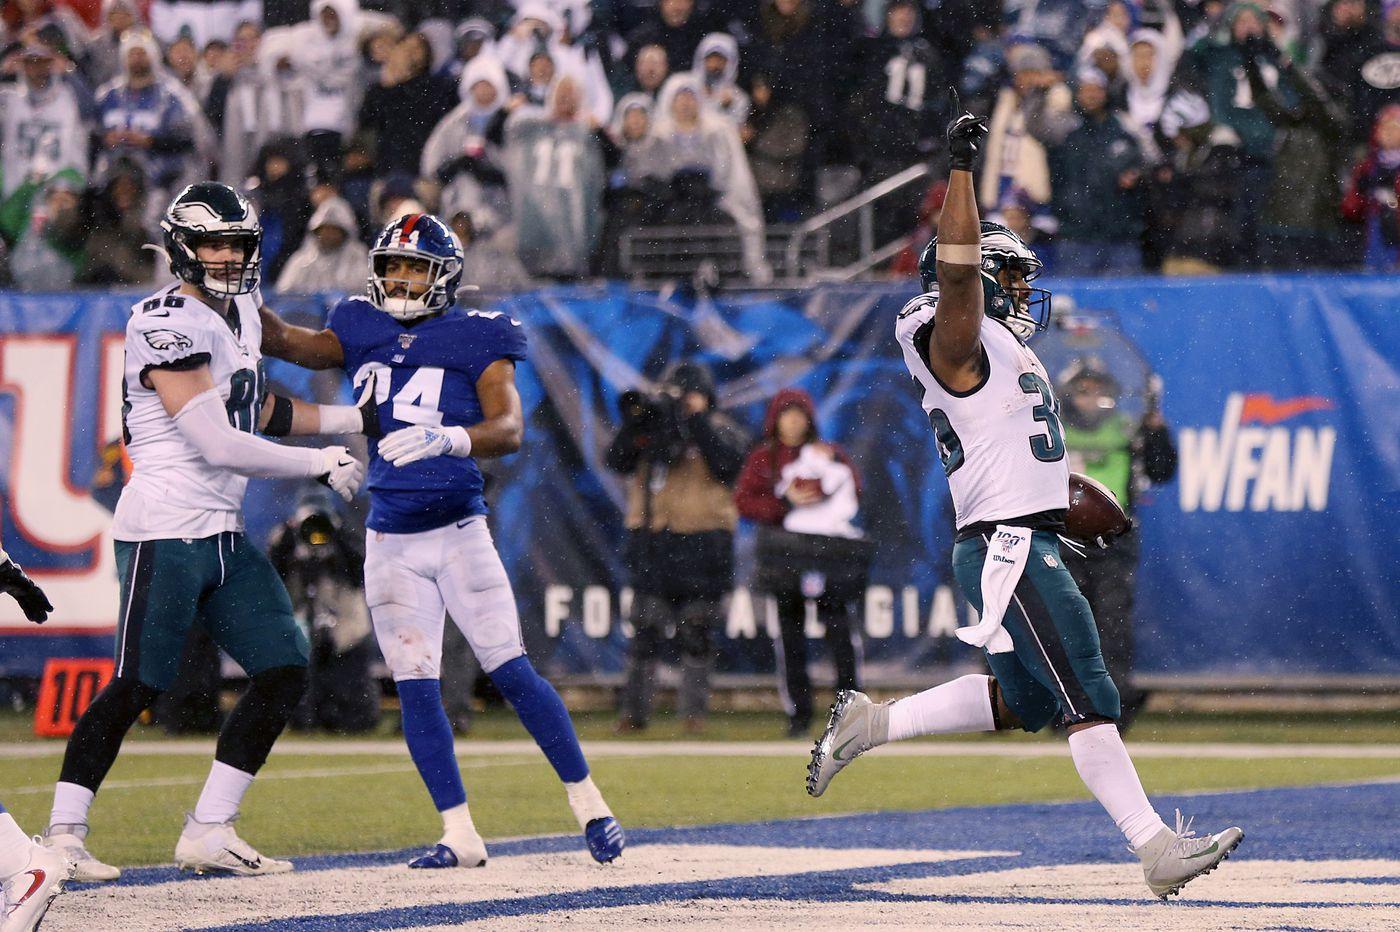 Eagles win NFC East as Boston Scott, Fletcher Cox, Carson Wentz lead a determined push past the Giants